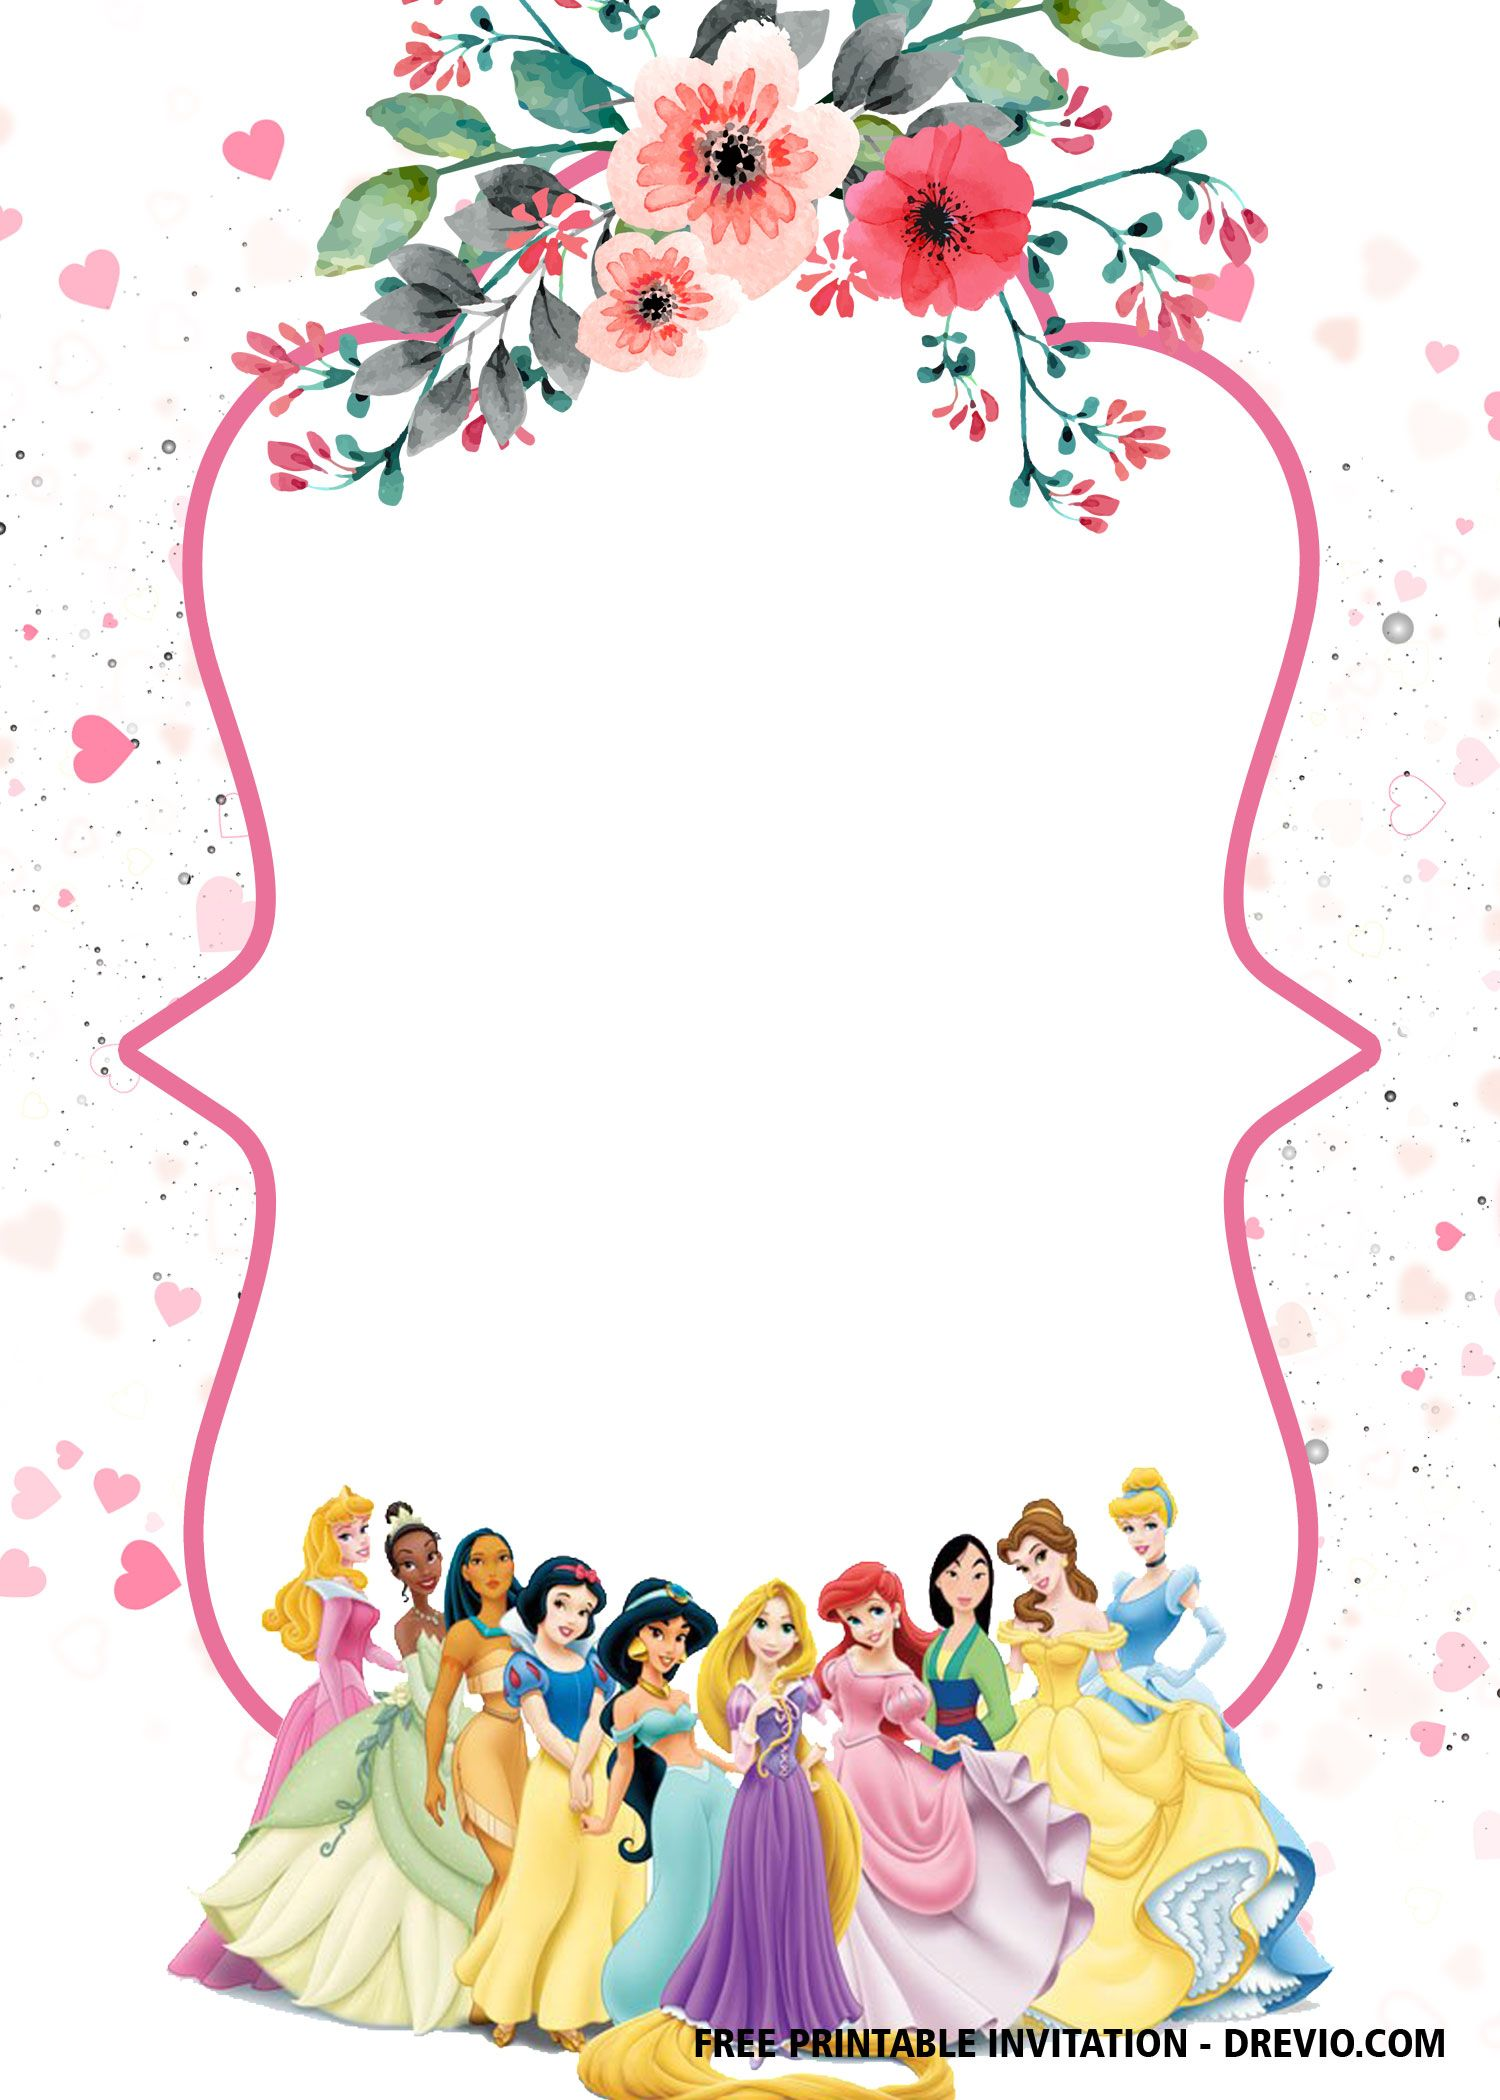 Free Disney Princess Invitation Template For Your Little Girl S Birthday Free Inv Princess Party Invitations Disney Princess Invitations Princess Invitations